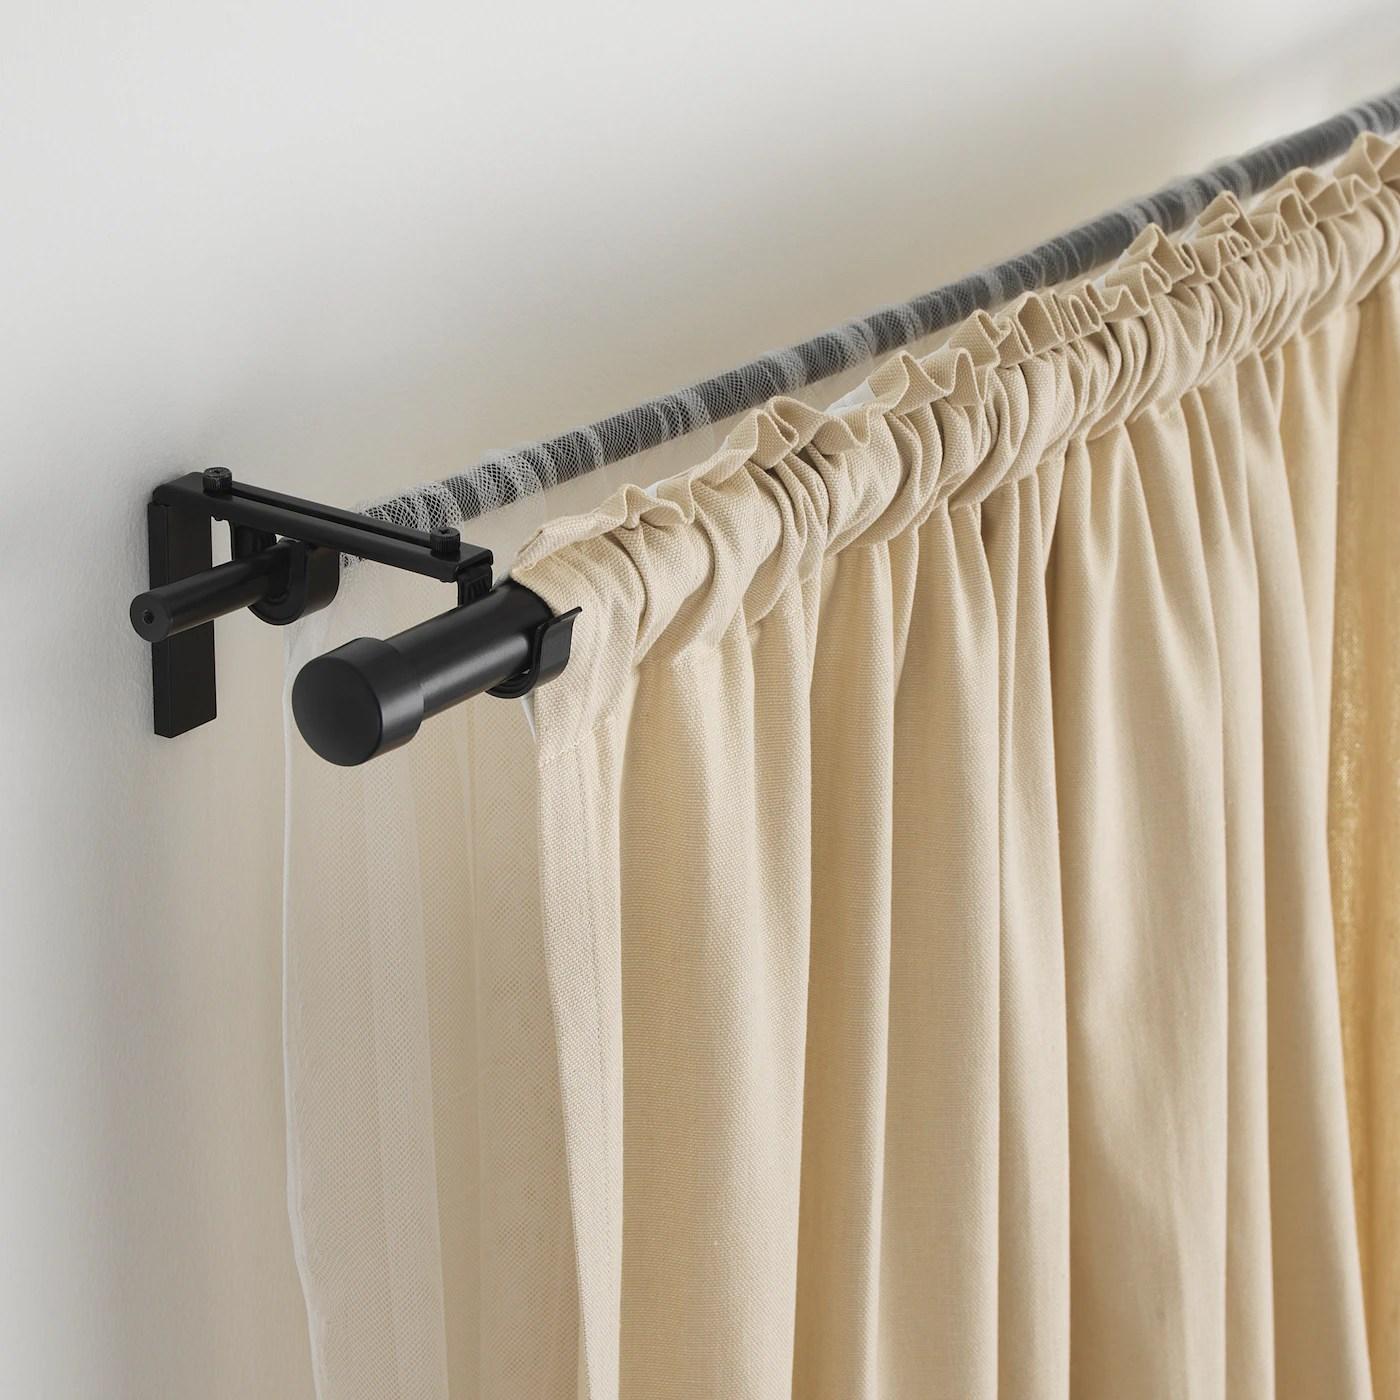 racka hugad double curtain rod combination black 120 210 cm